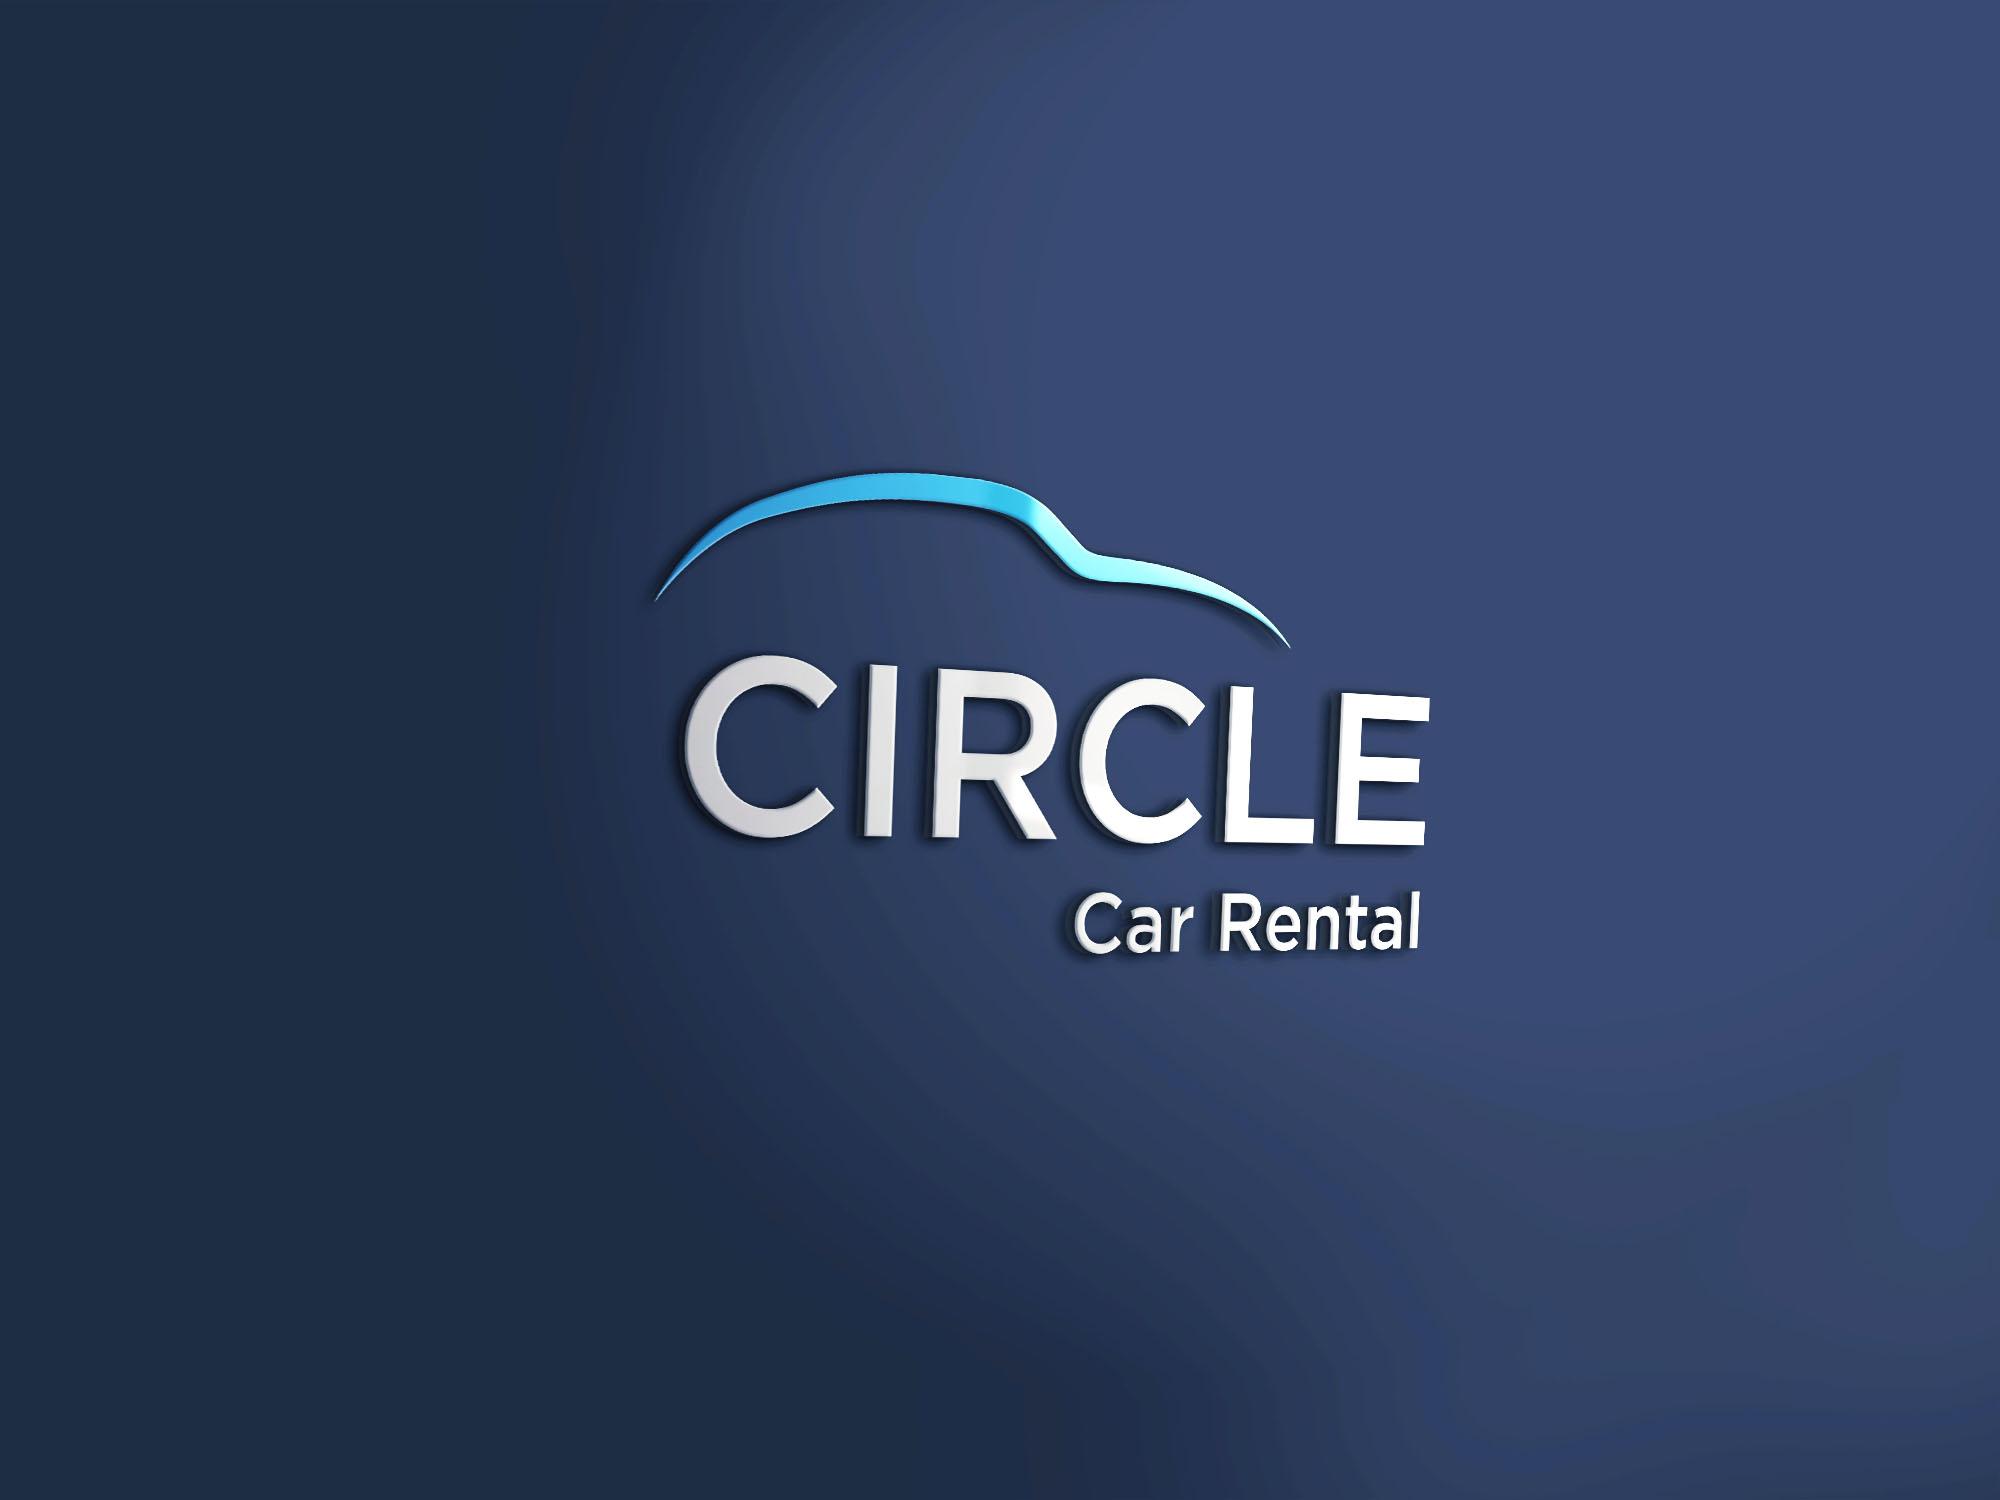 Circle Car Rental 3d Mockup1